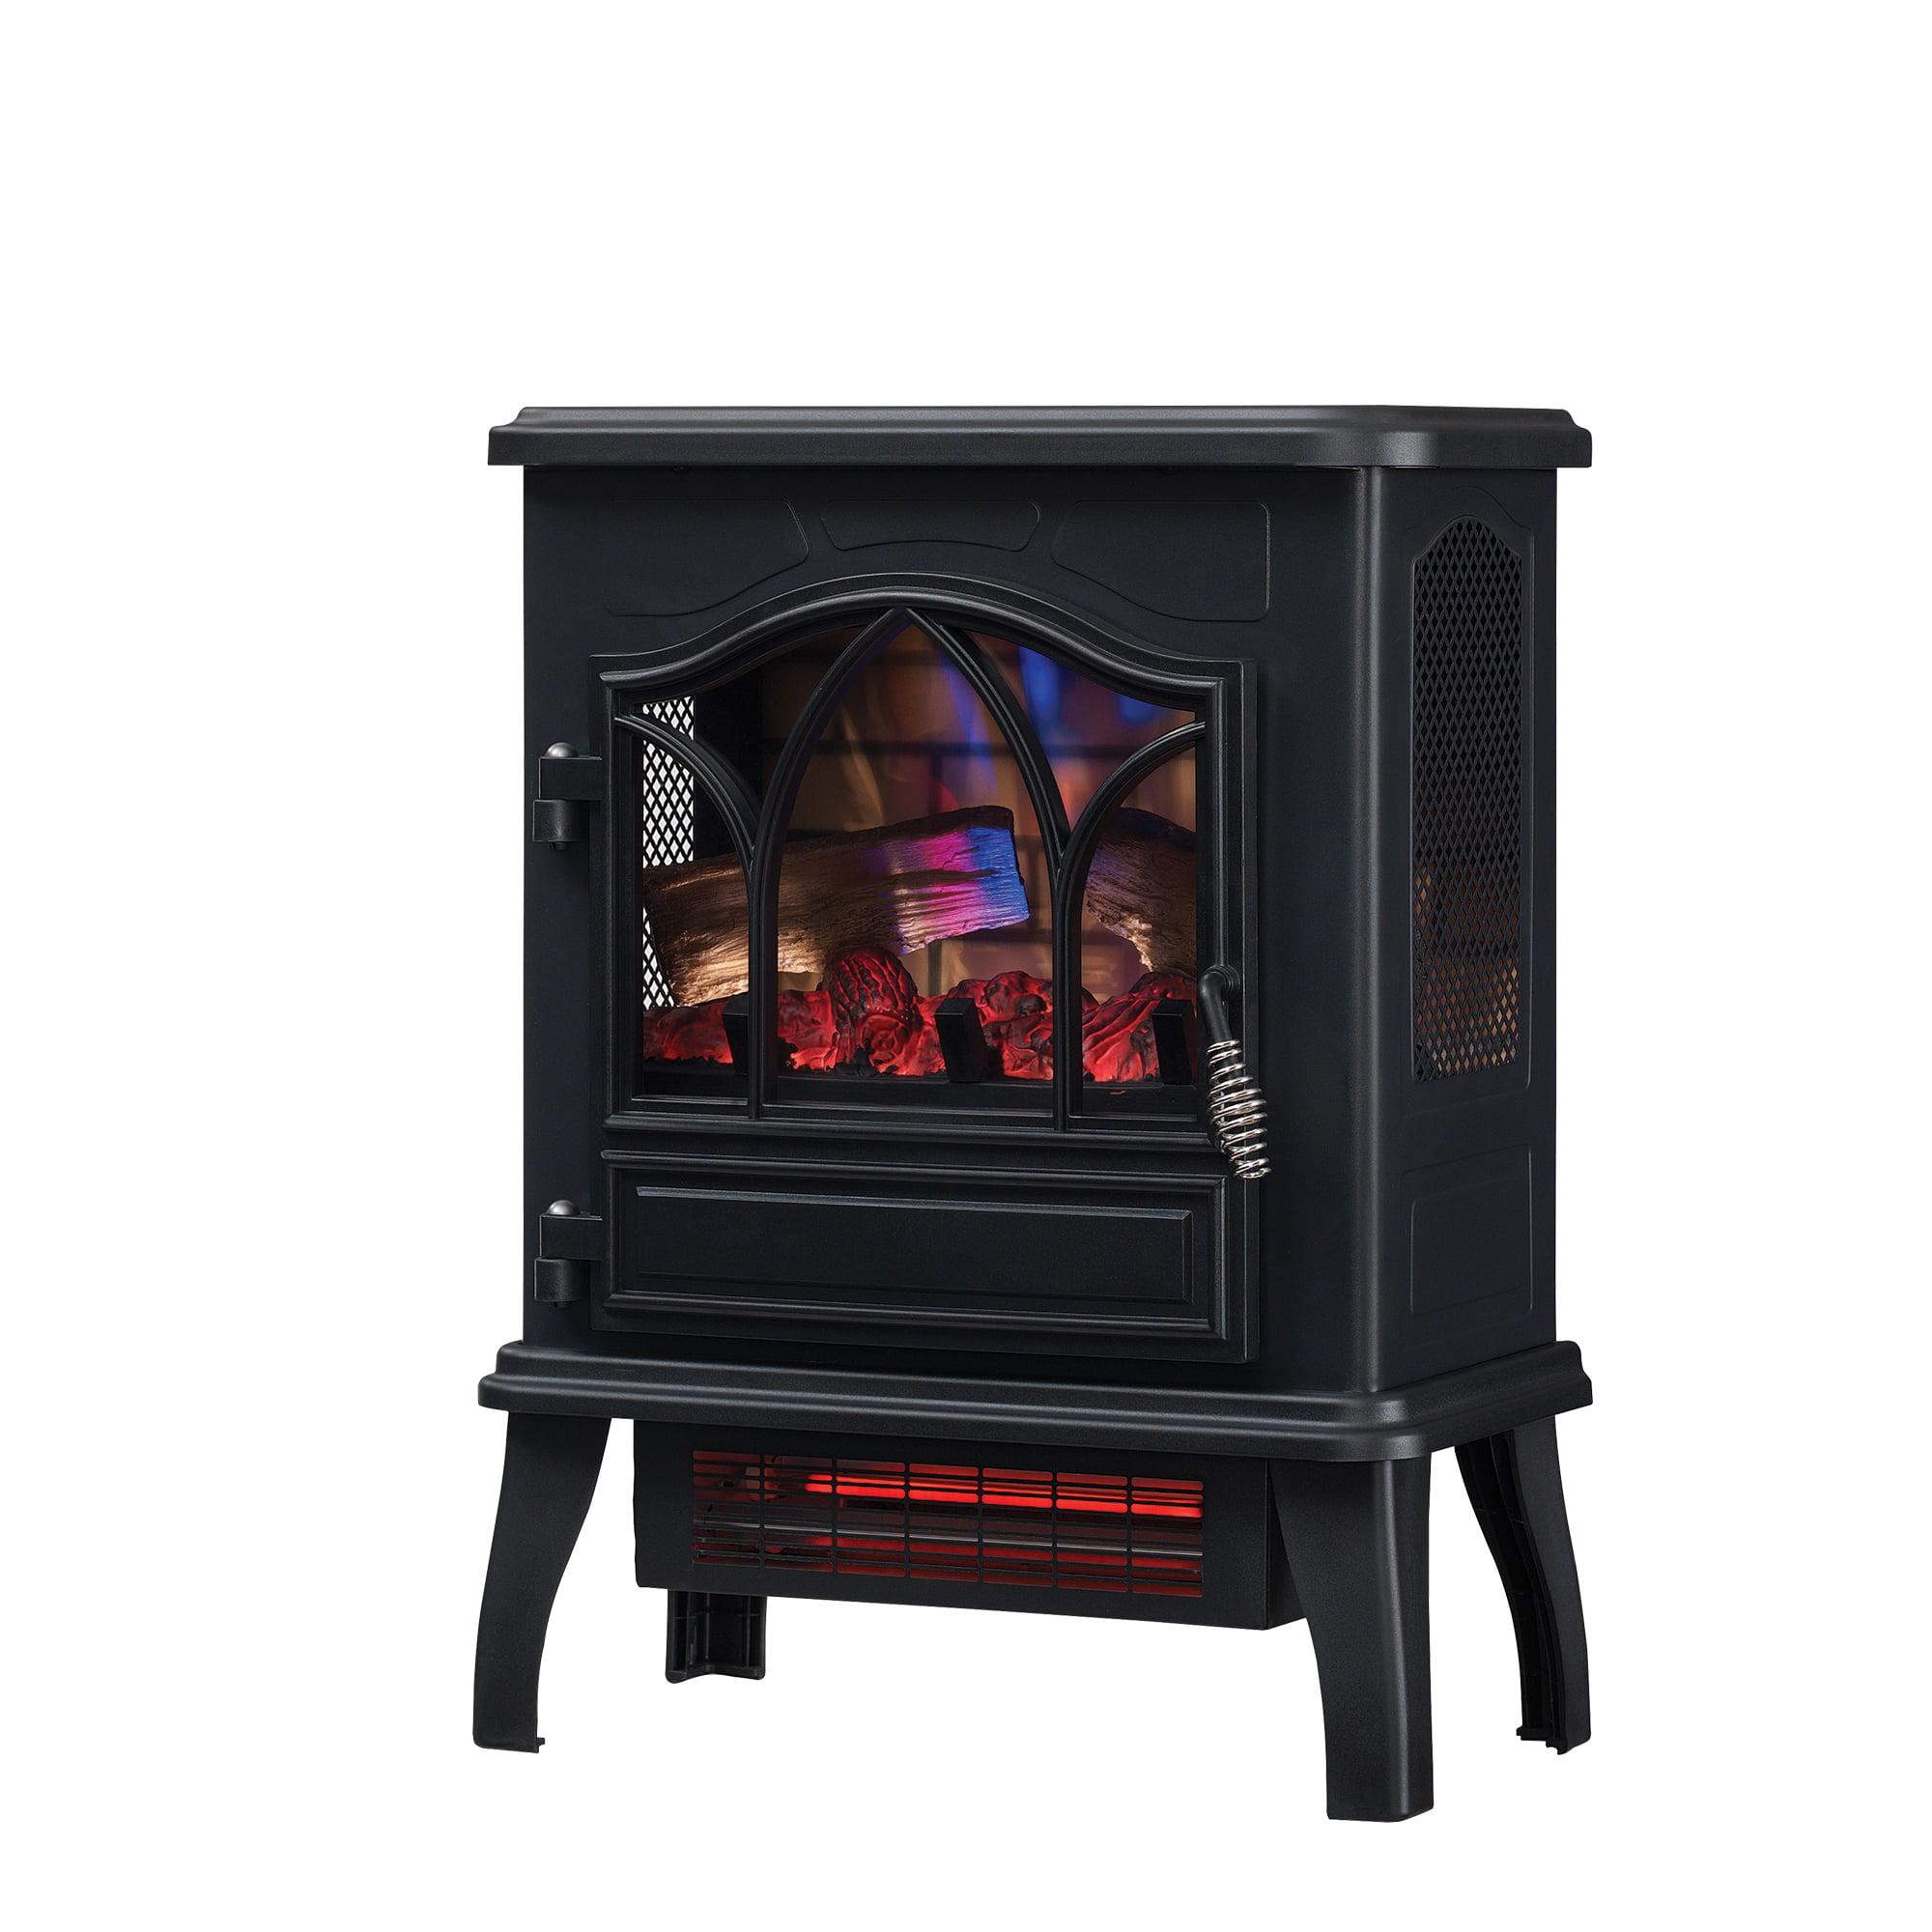 ChimneyFree Infrared Quartz Electric Space Heater, 5,200 BTU, Black Metal #CFI-470-02